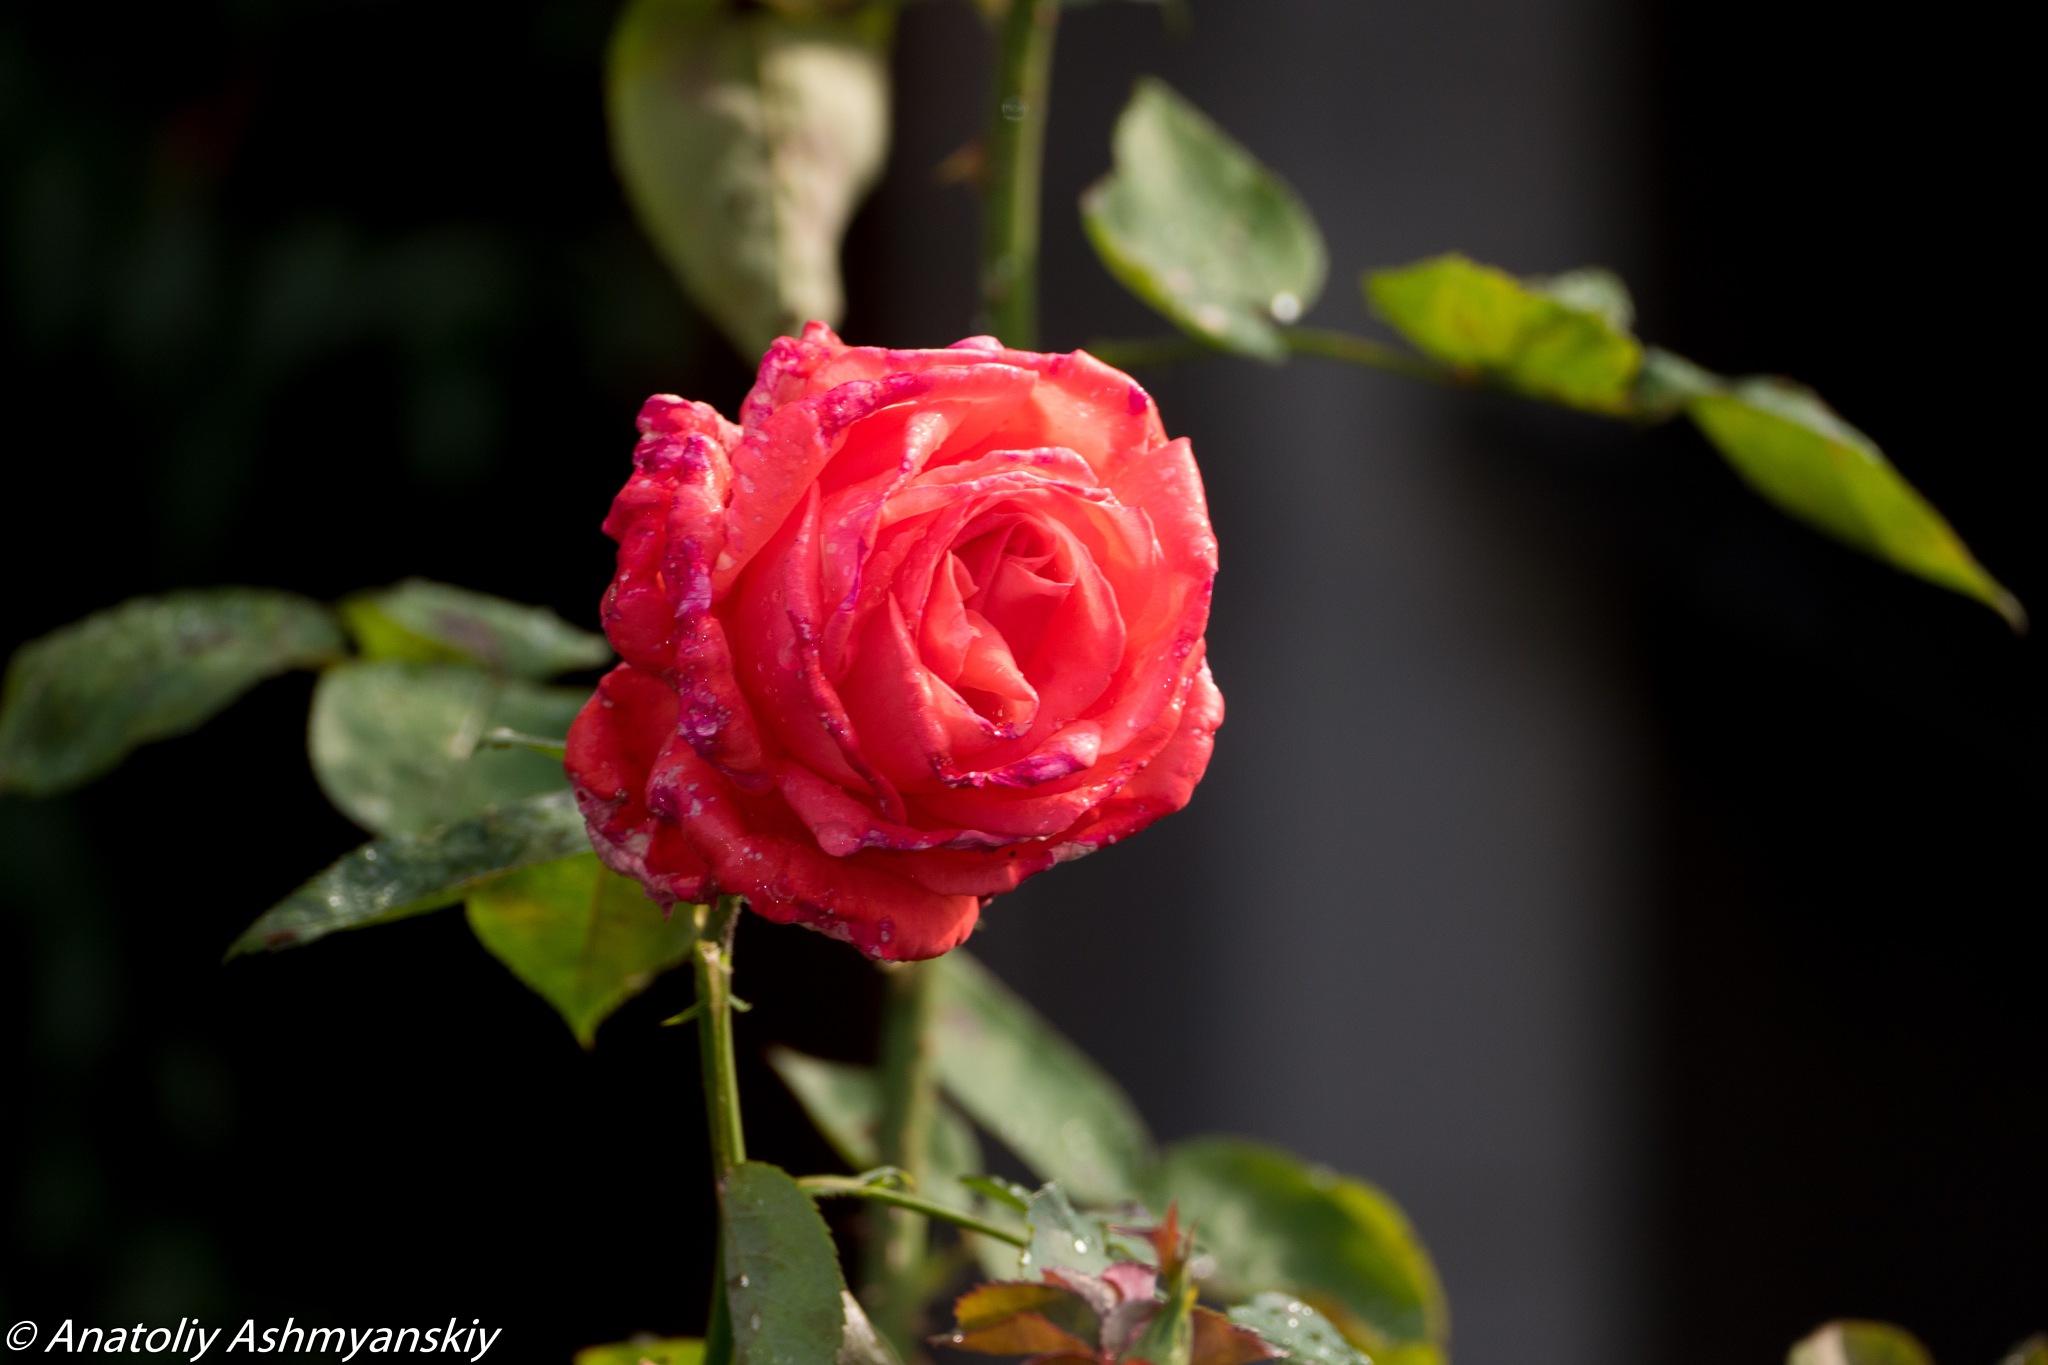 Red rose by Anatoliy Ashmyanskiy